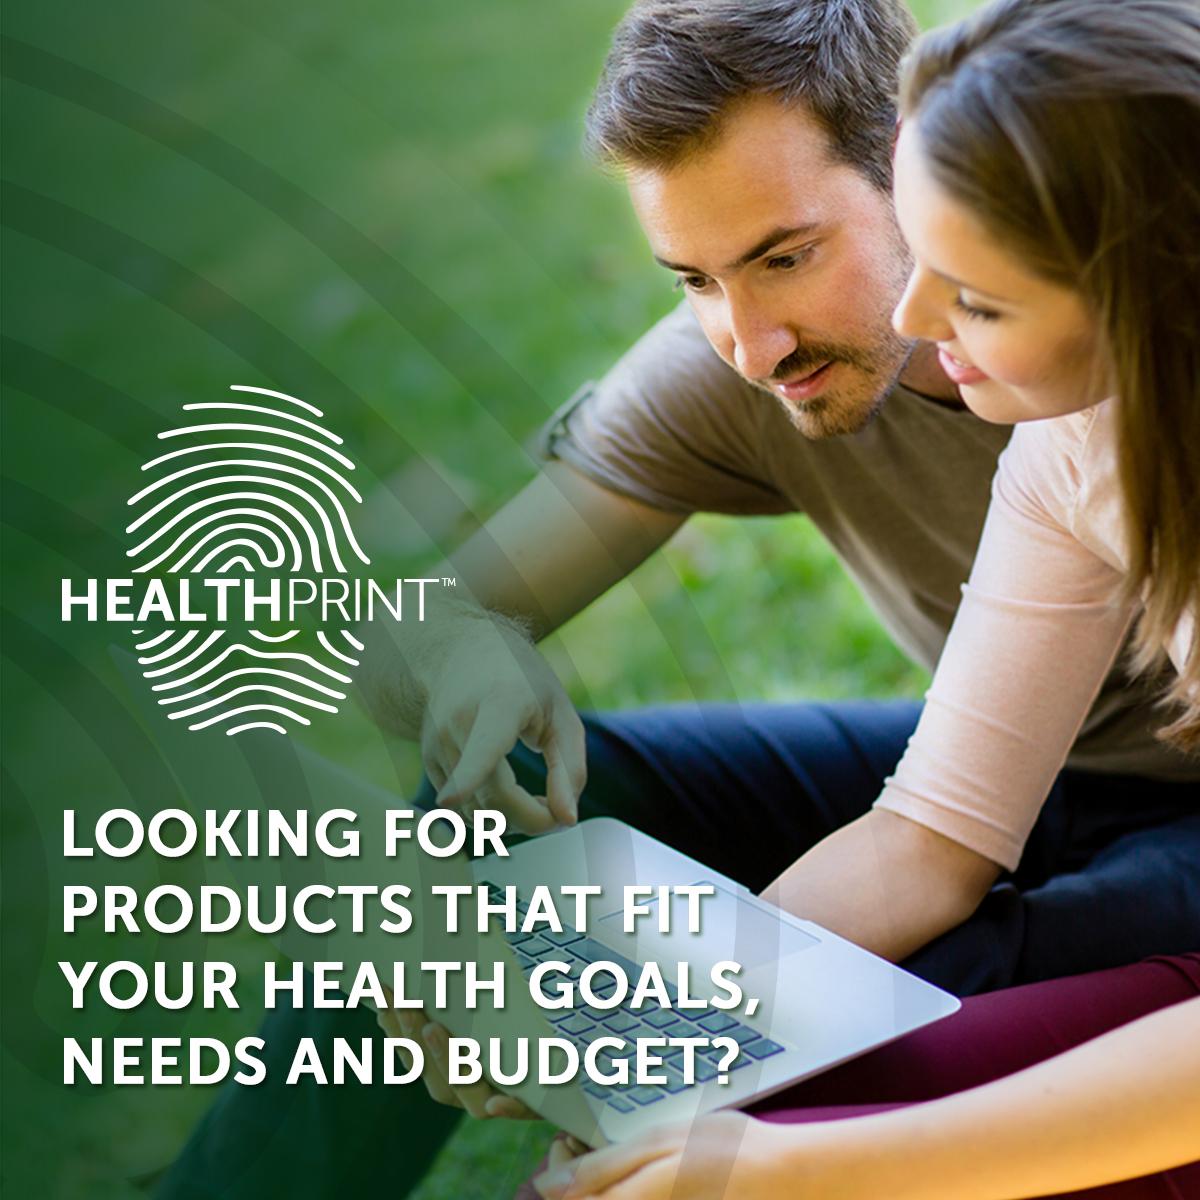 img-healthprint-fb-download08.jpg